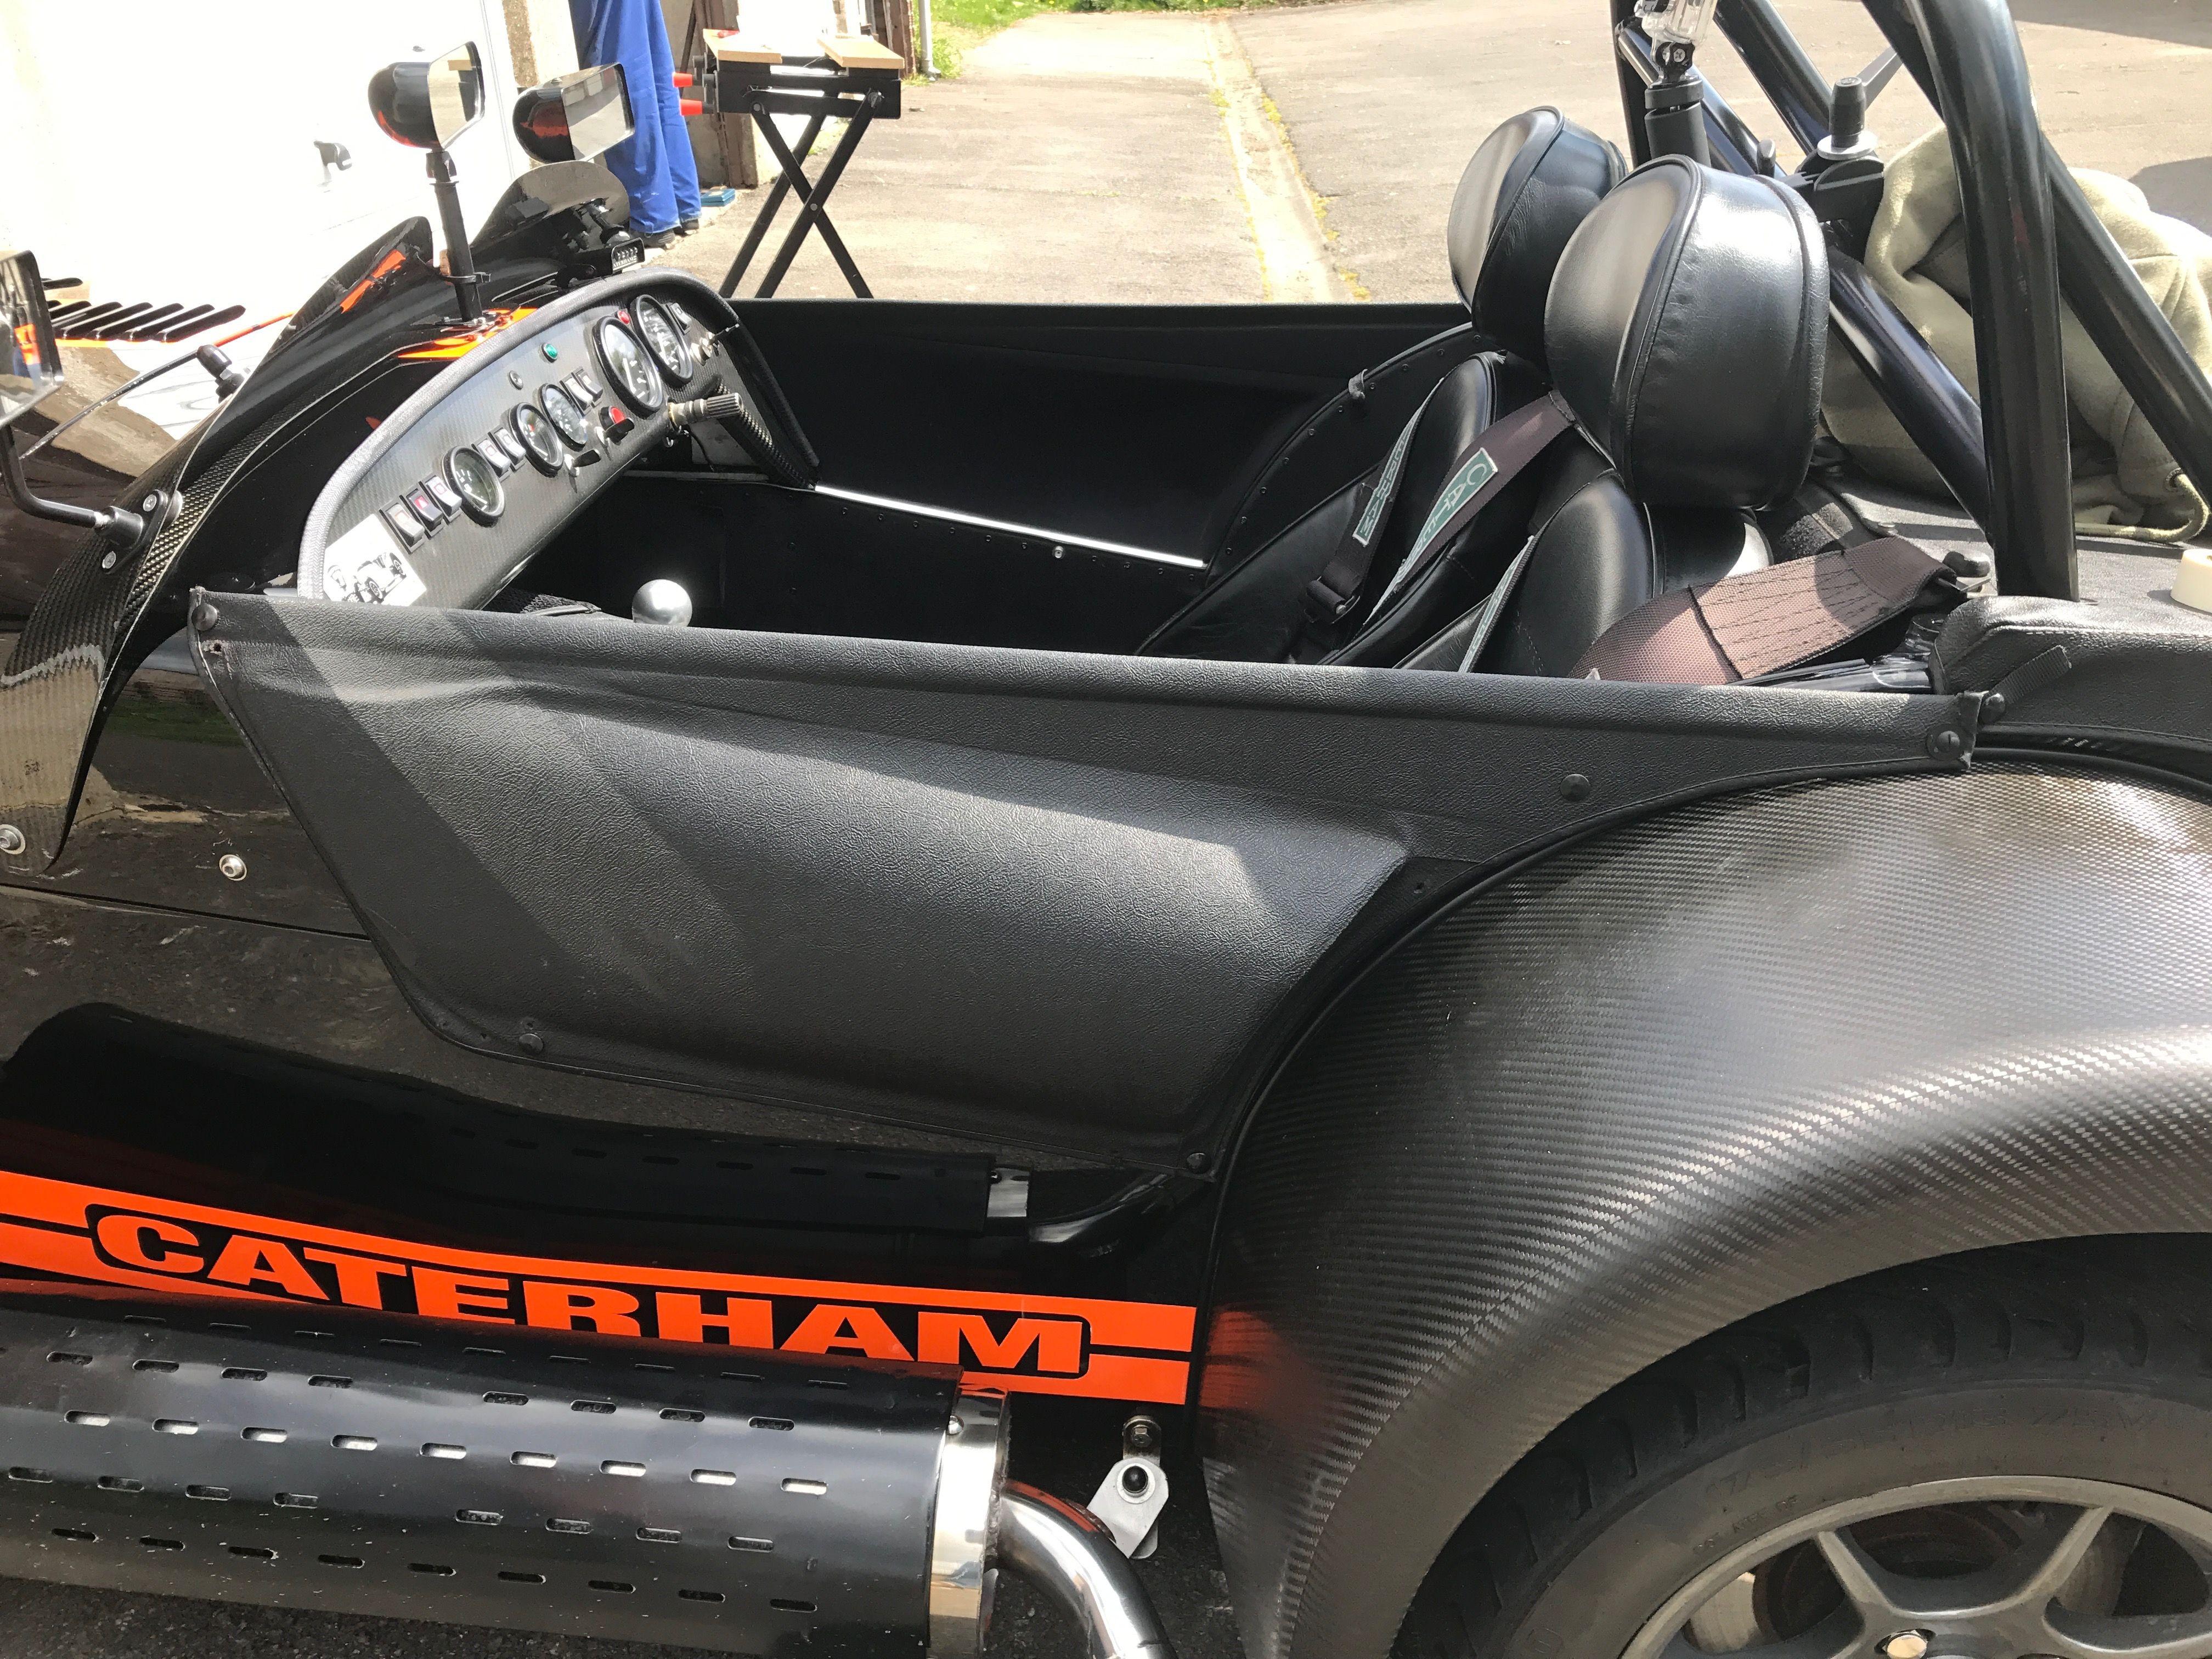 Pin by Ridersuper7 on Caterham Super 7 Caterham super 7